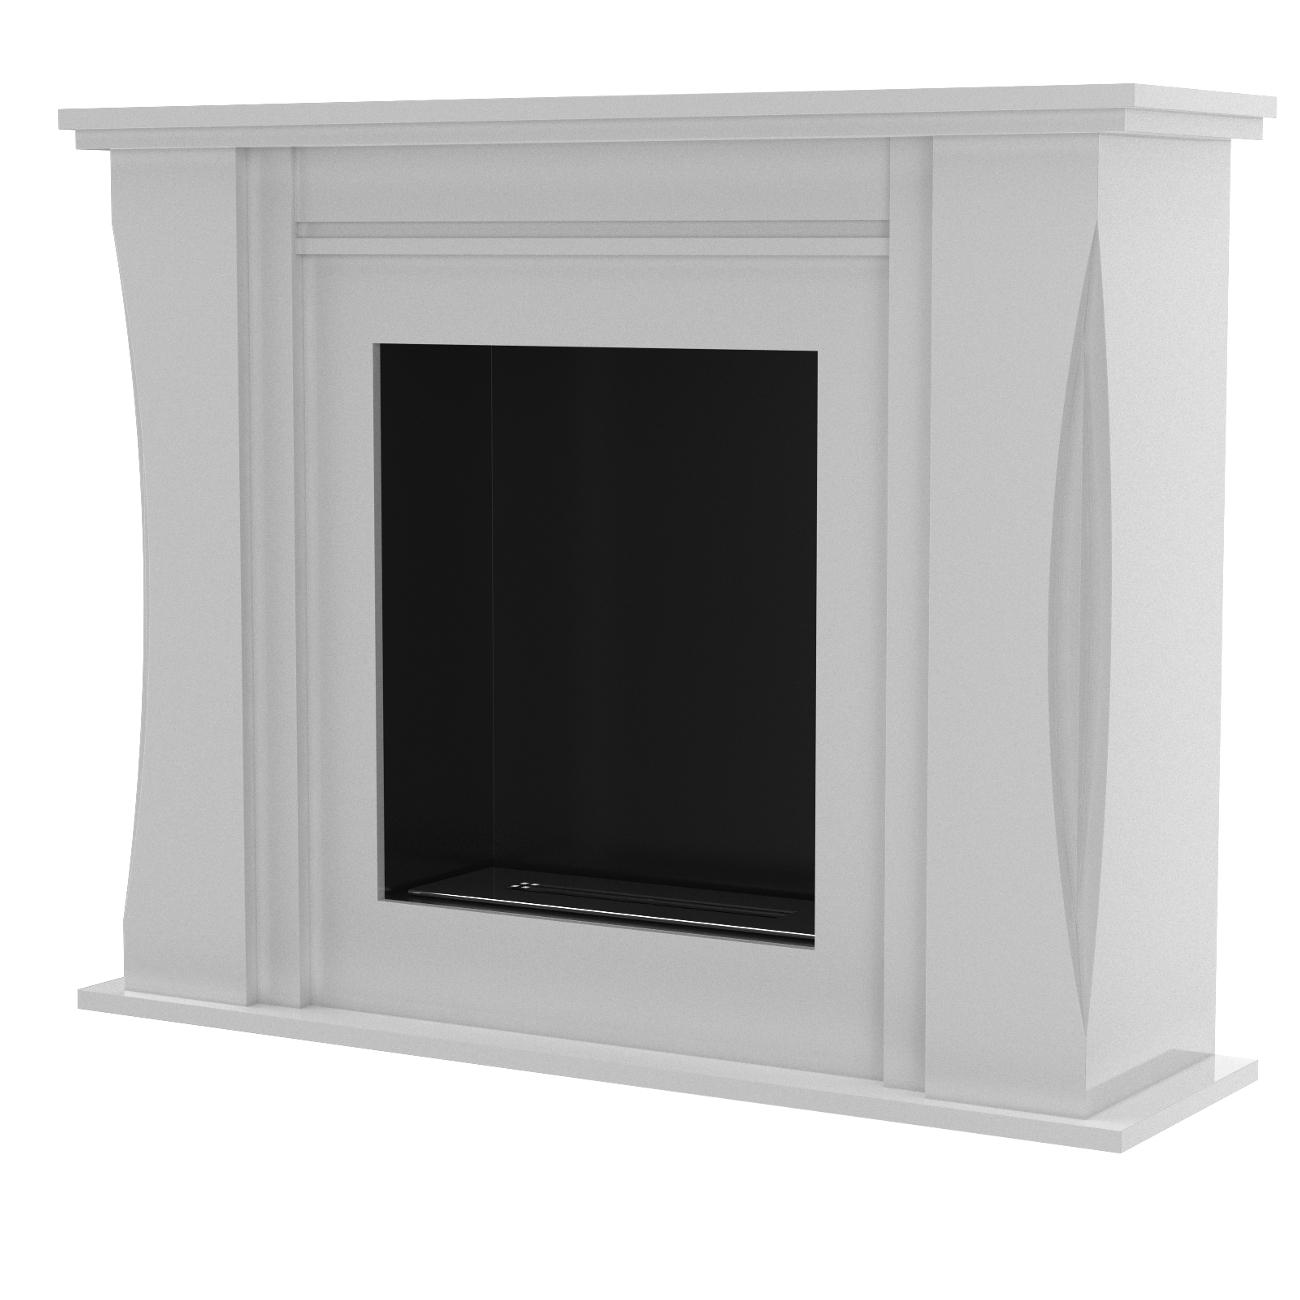 Fireplaces Etc New Biokamin Ethanolkamin May Tüv Geprüft